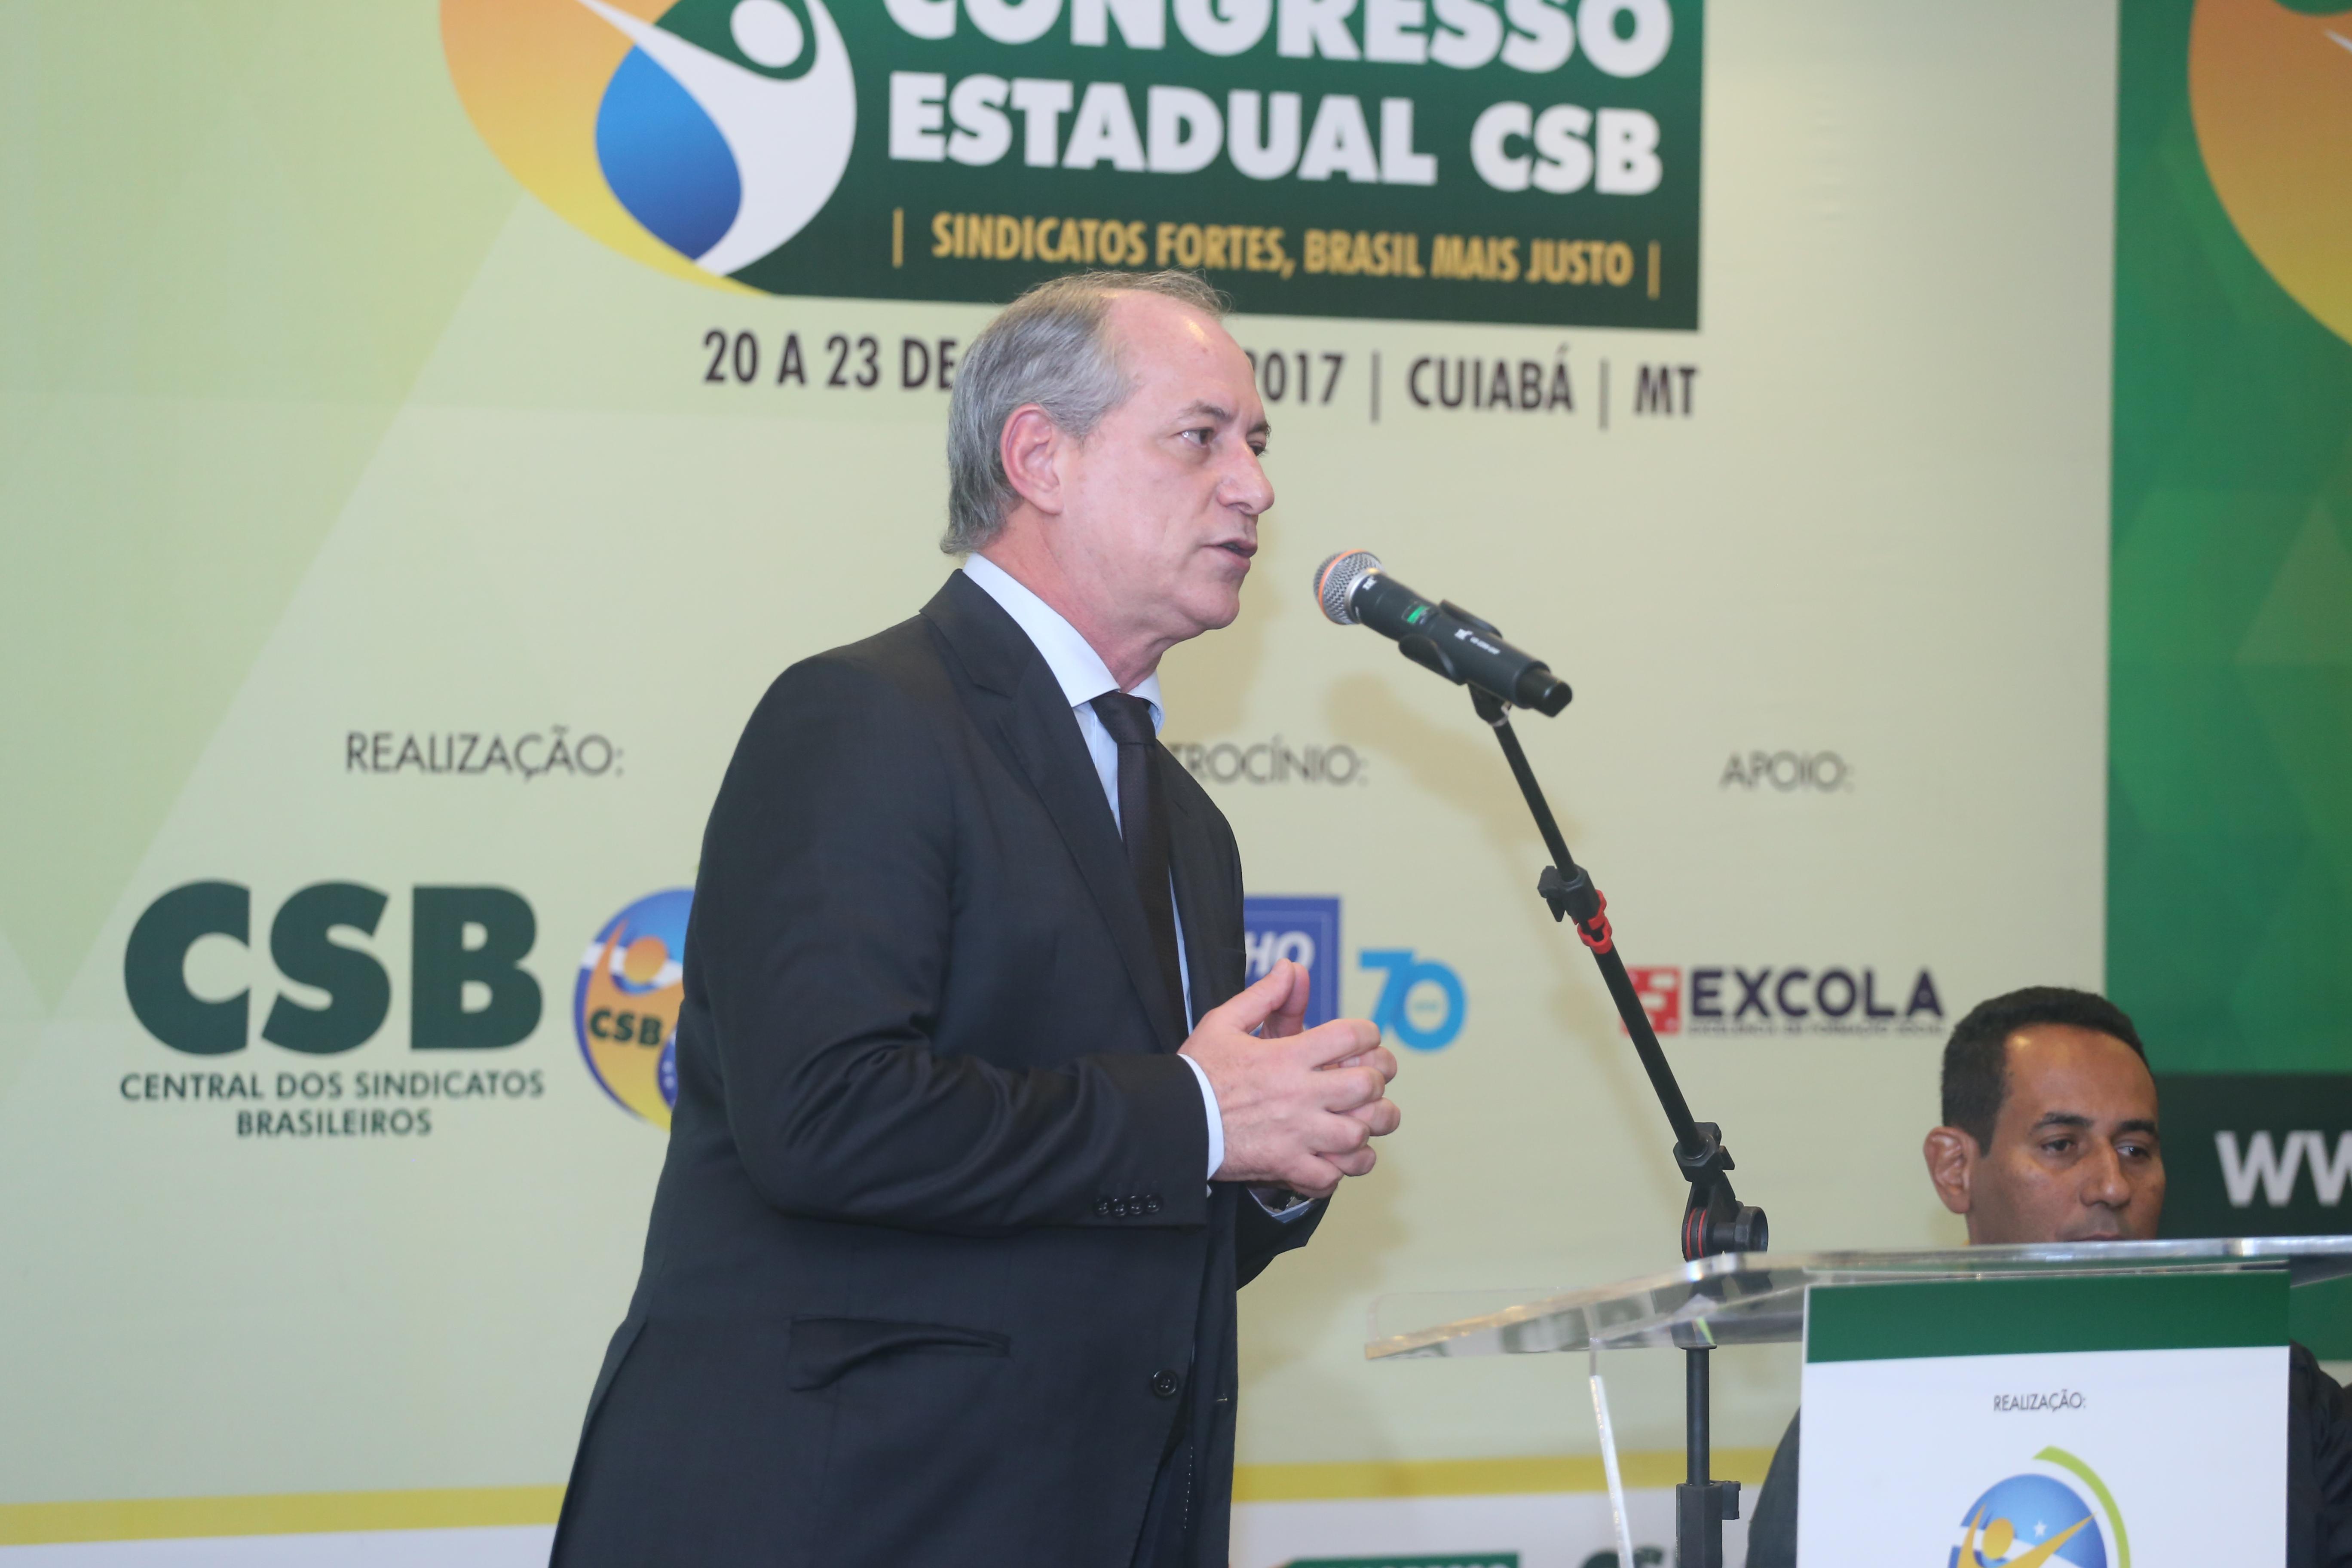 Palestra de Ciro Gomes – Congresso Estadual CSB Mato Grosso – 20 de junho   2017